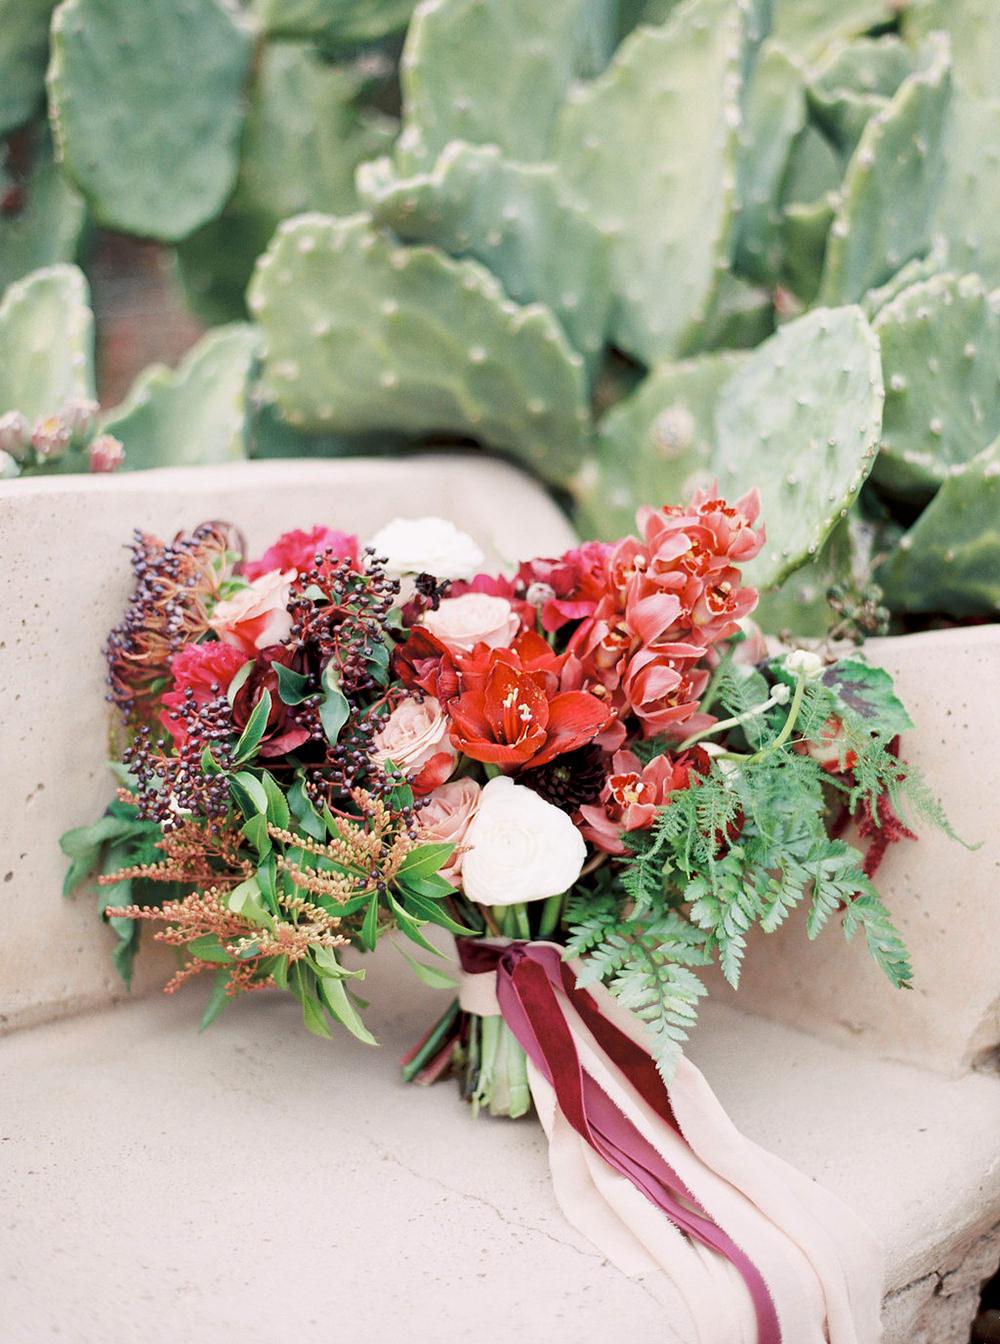 romantic wedding bouquets - photo by Amanda Lenhardt https://ruffledblog.com/relaxed-san-juan-capistrano-wedding-inspiration